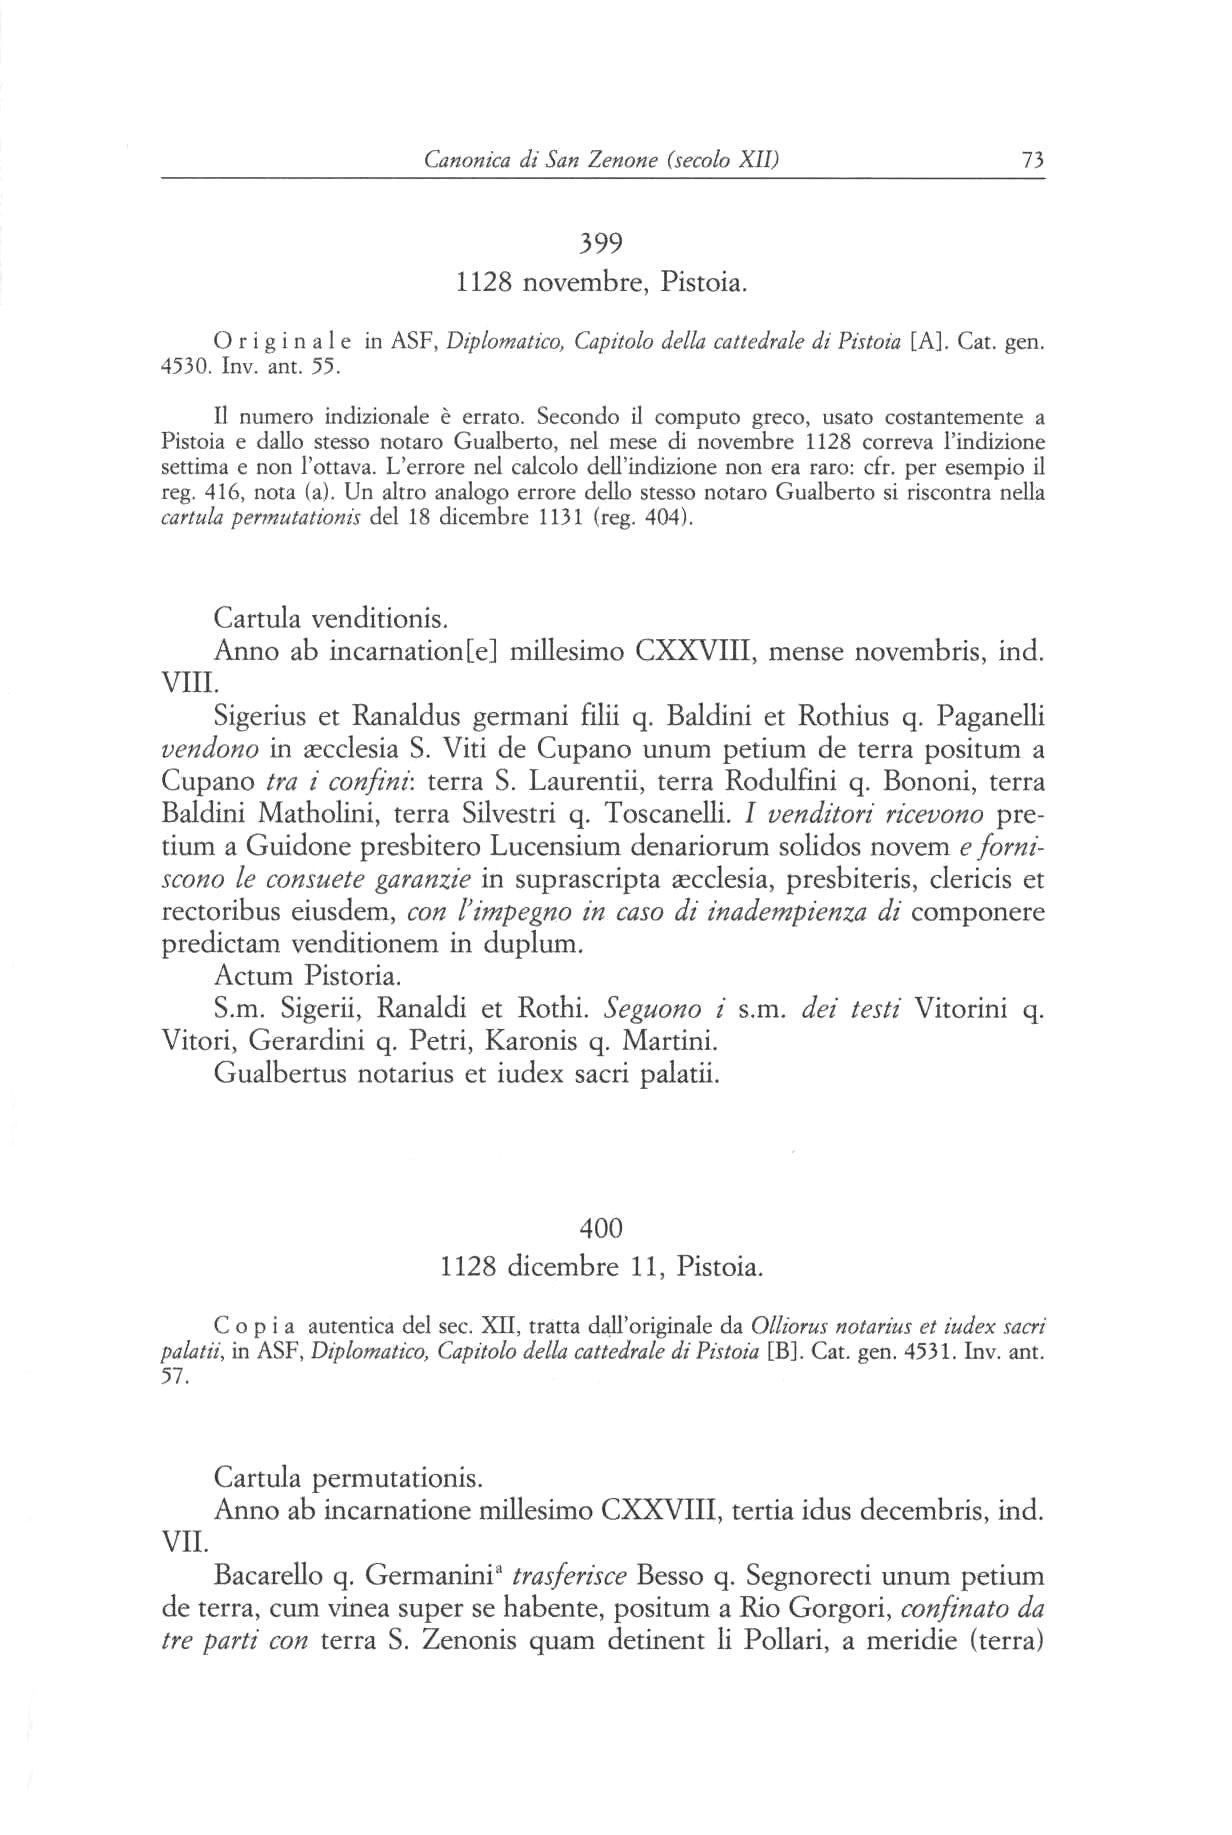 Canonica S. Zenone XII 0073.jpg